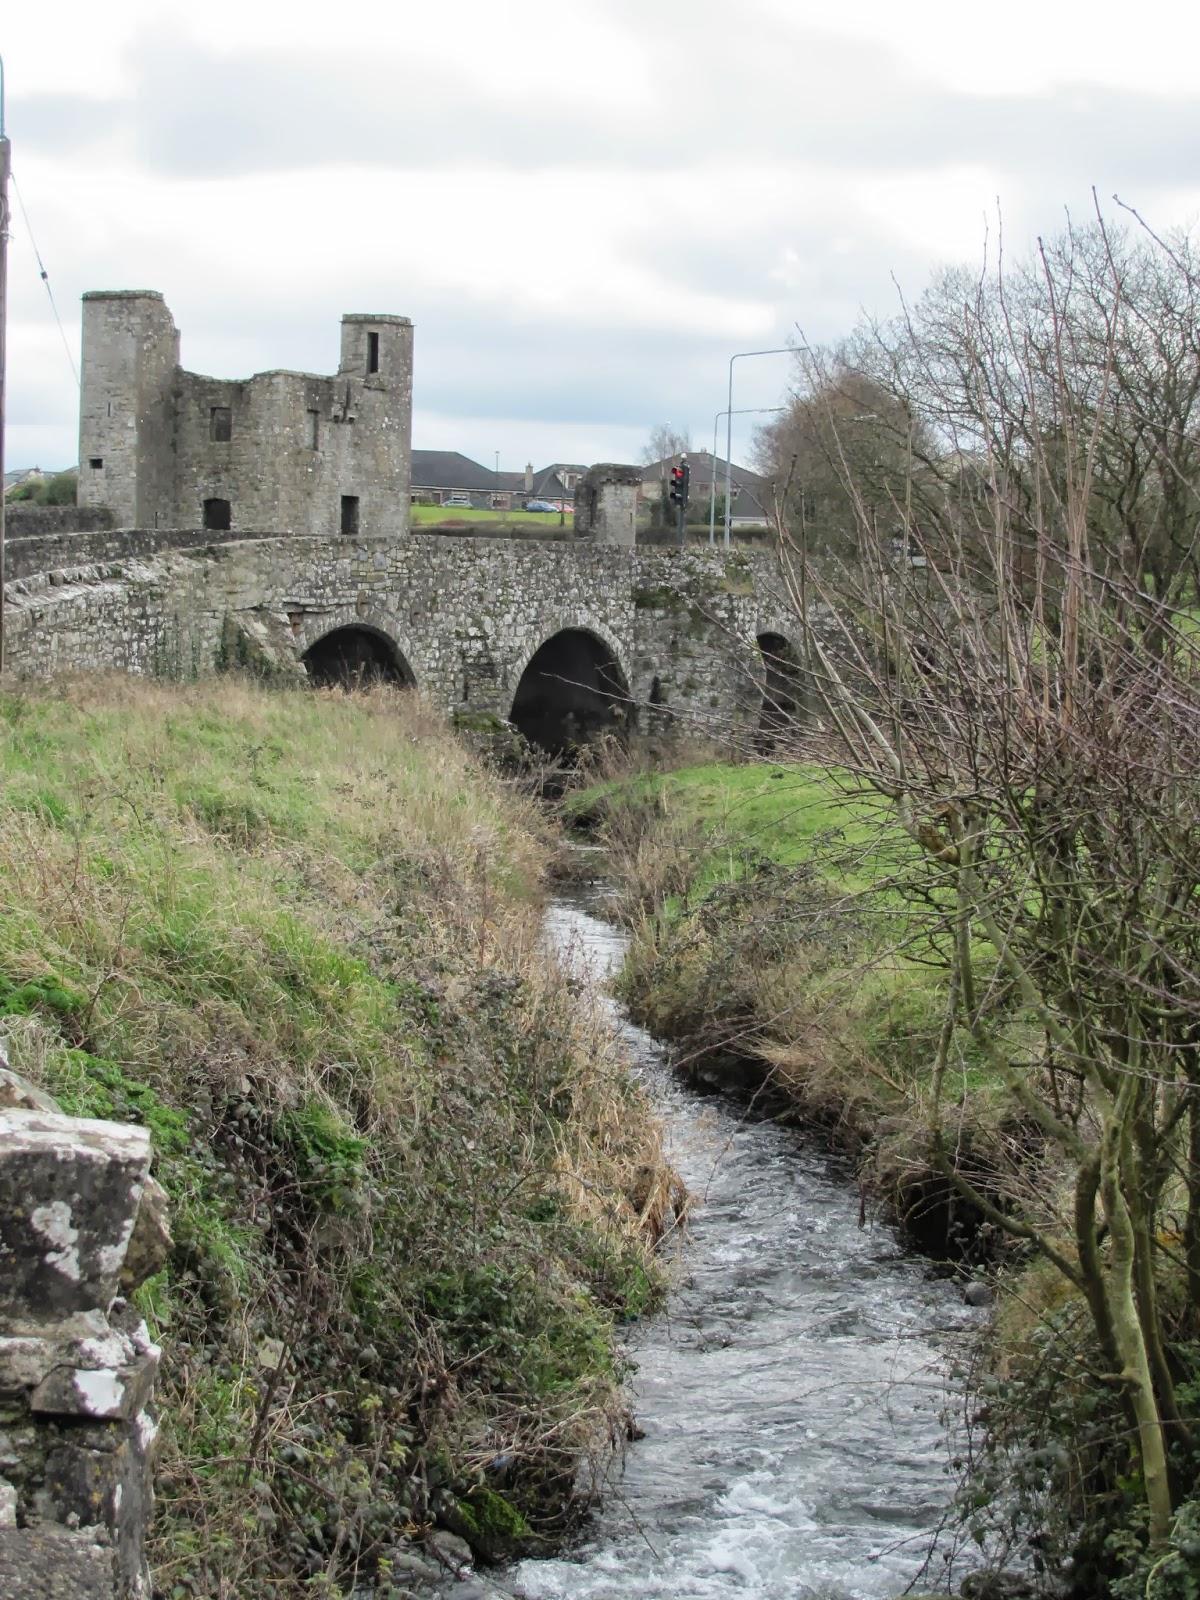 Narrow Road Bridge in Trim, Ireland